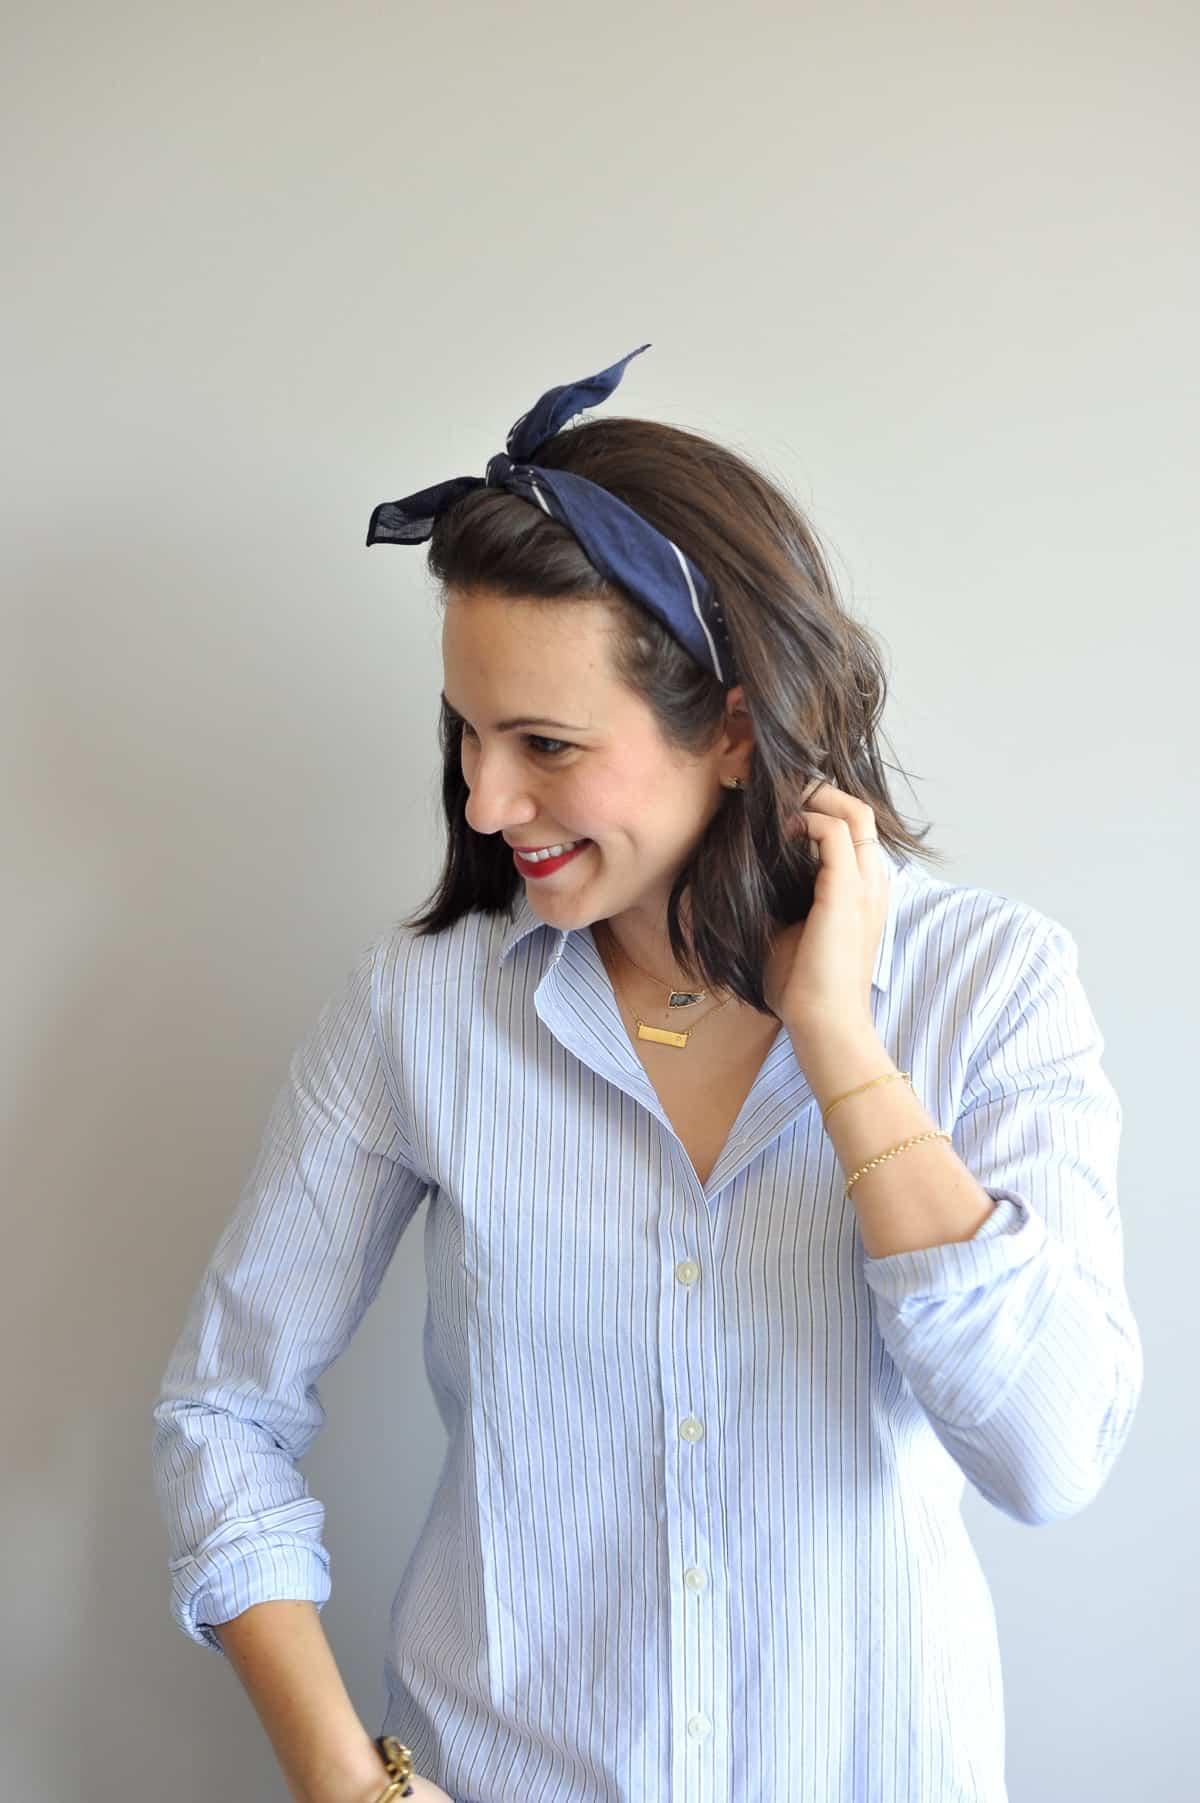 different ways to wear a neck scarf - My Style Vita @mystylevita